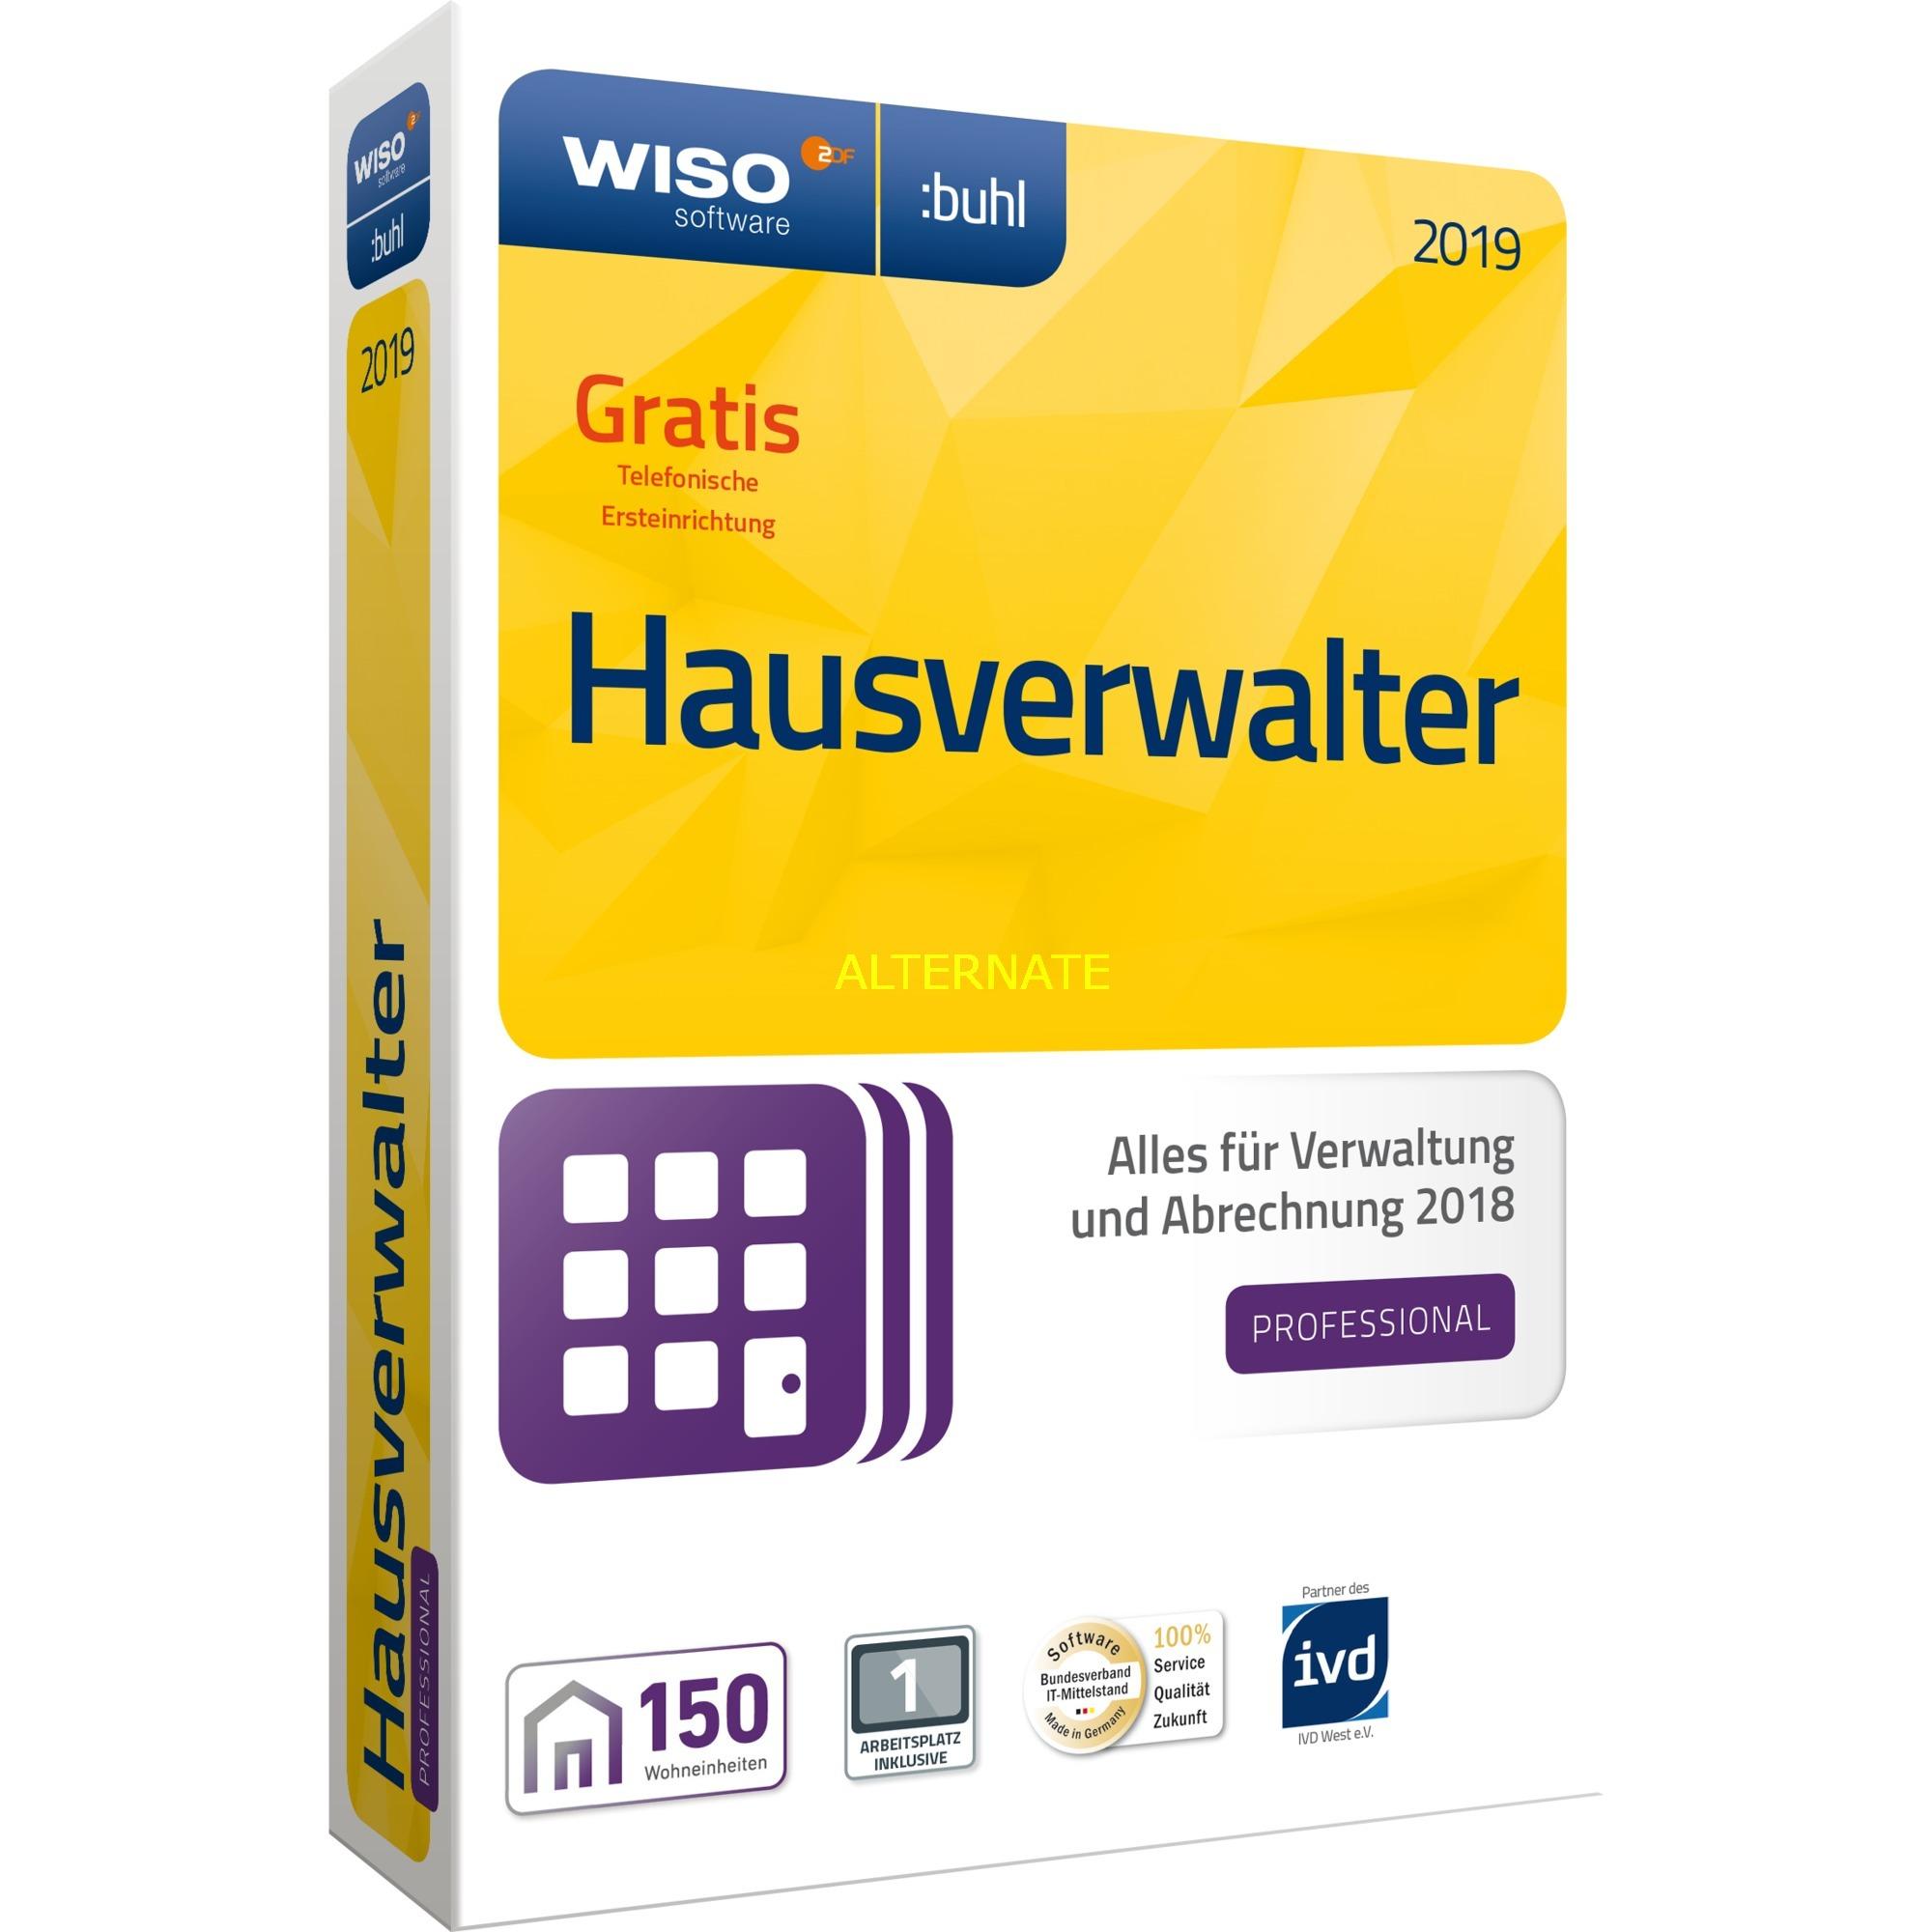 KW42694-19, Software